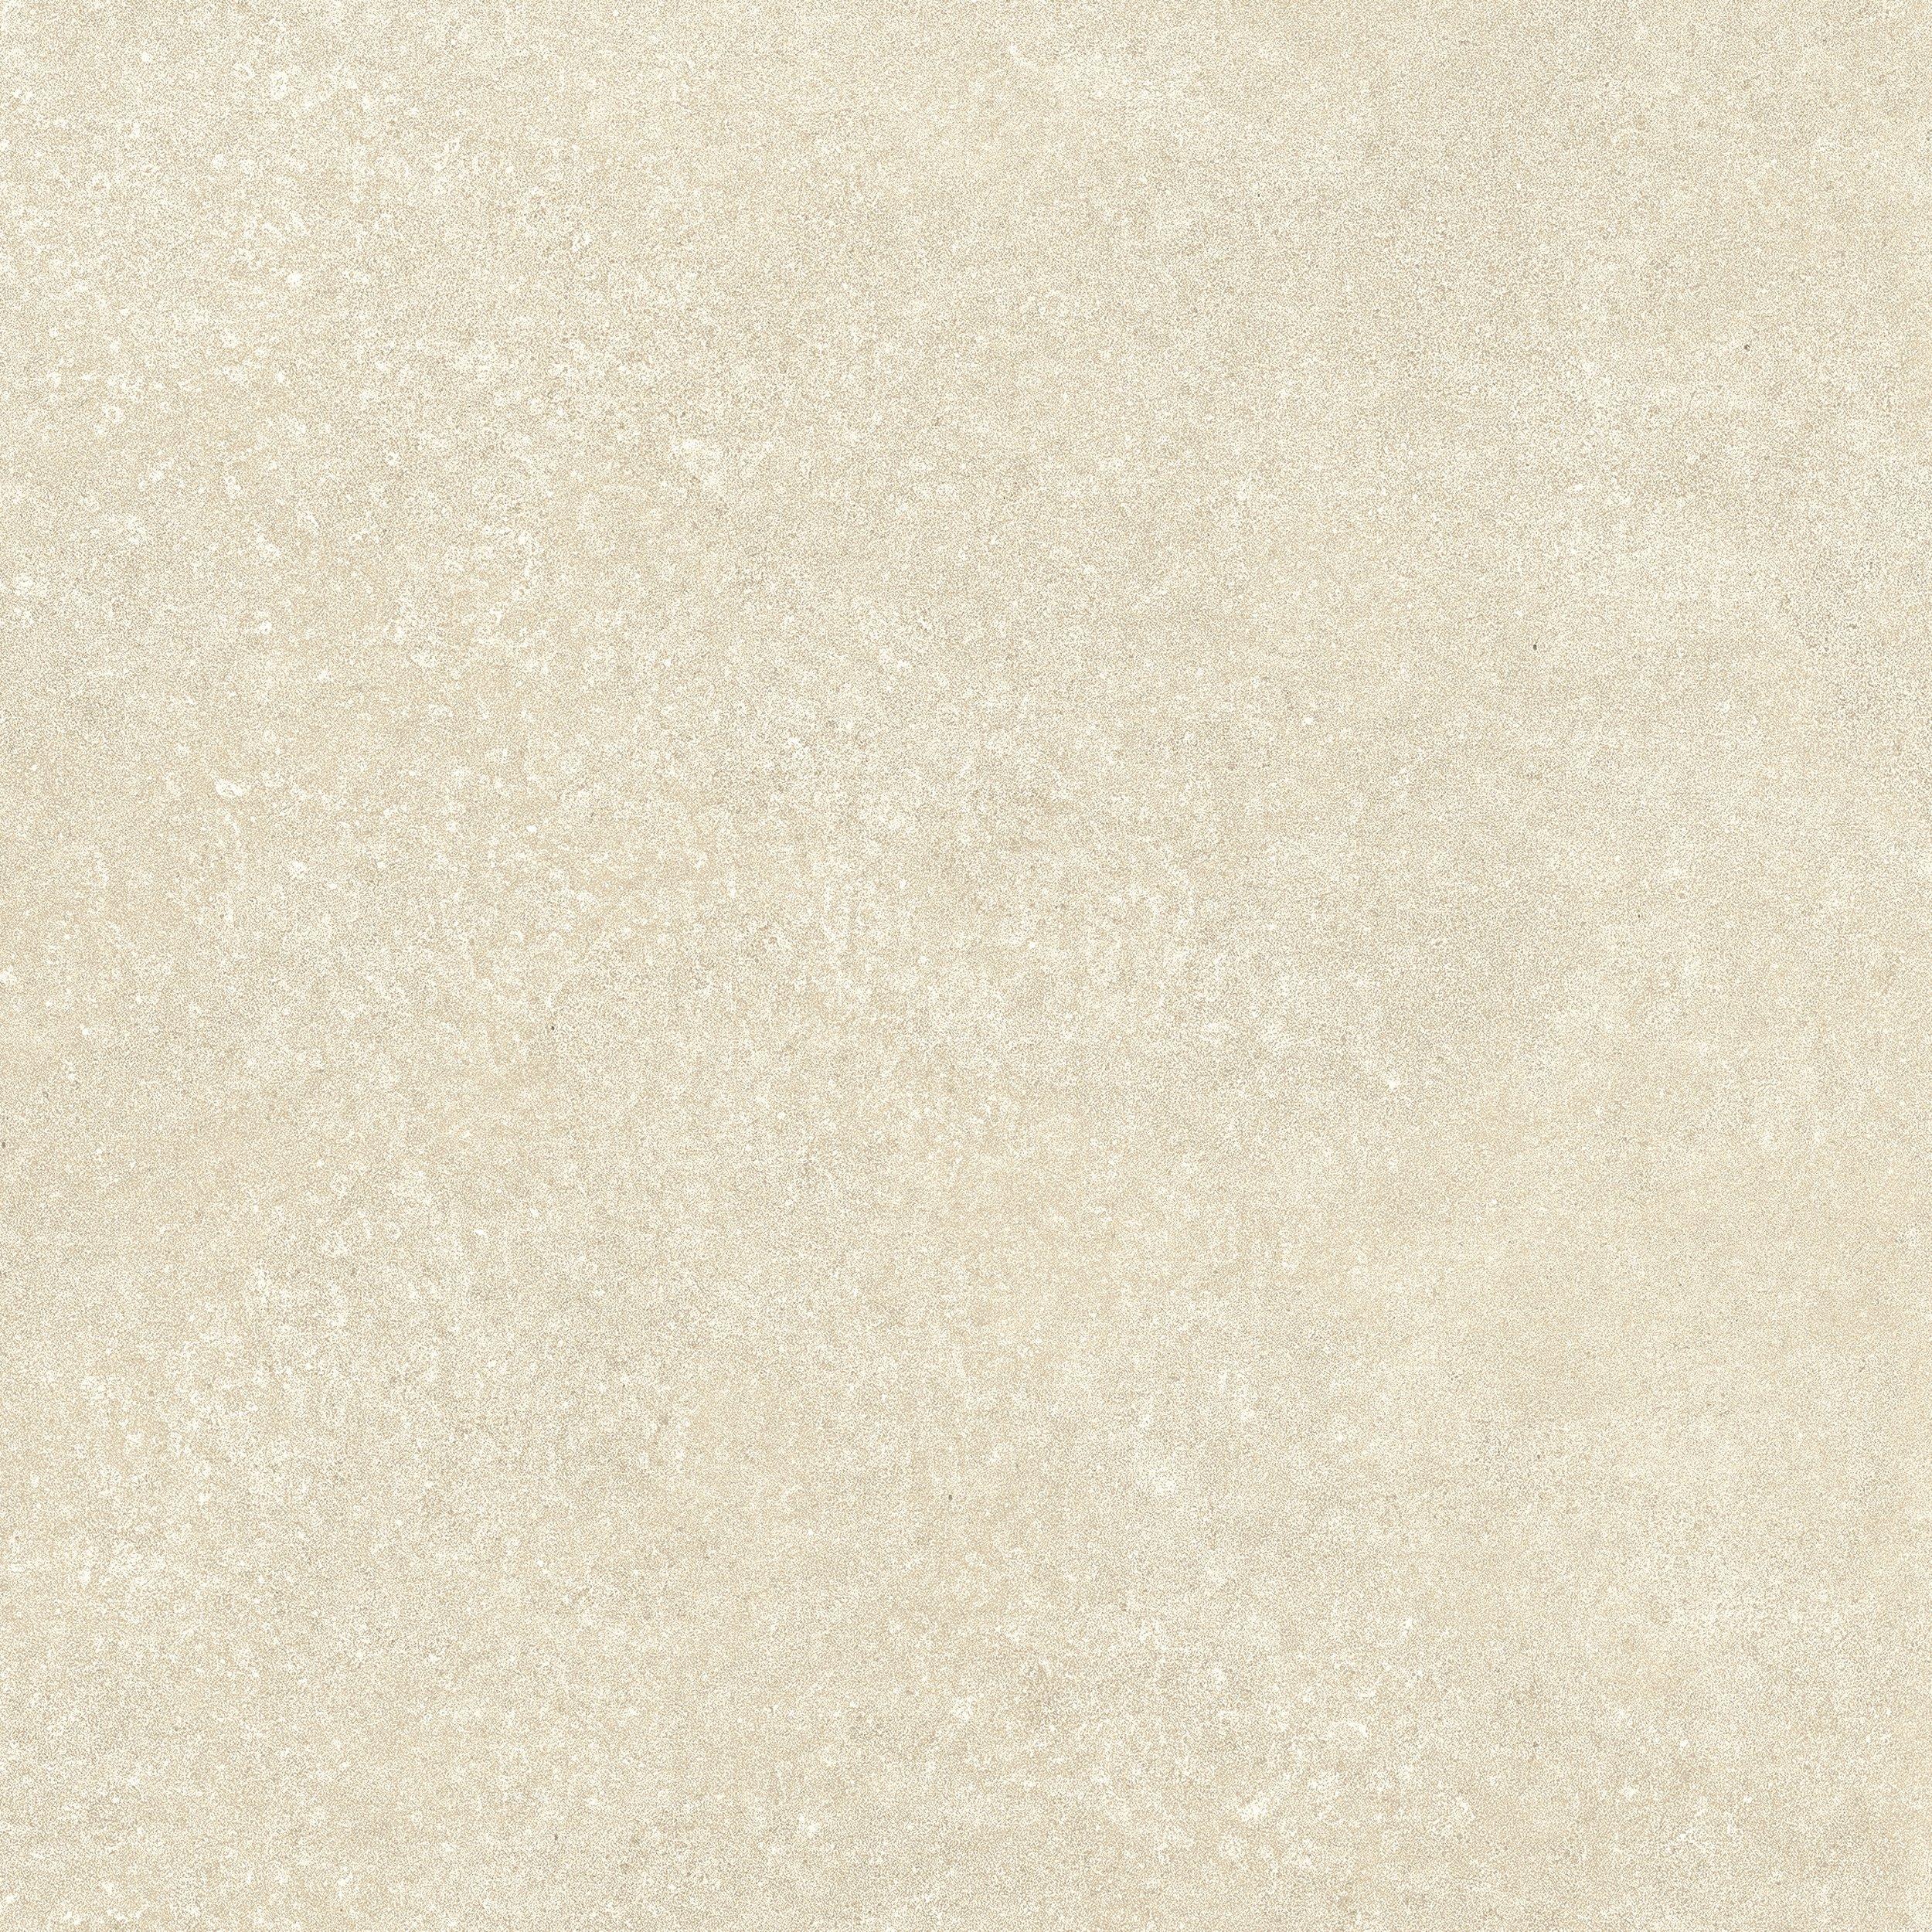 GẠCH AB URANO 40x120cm